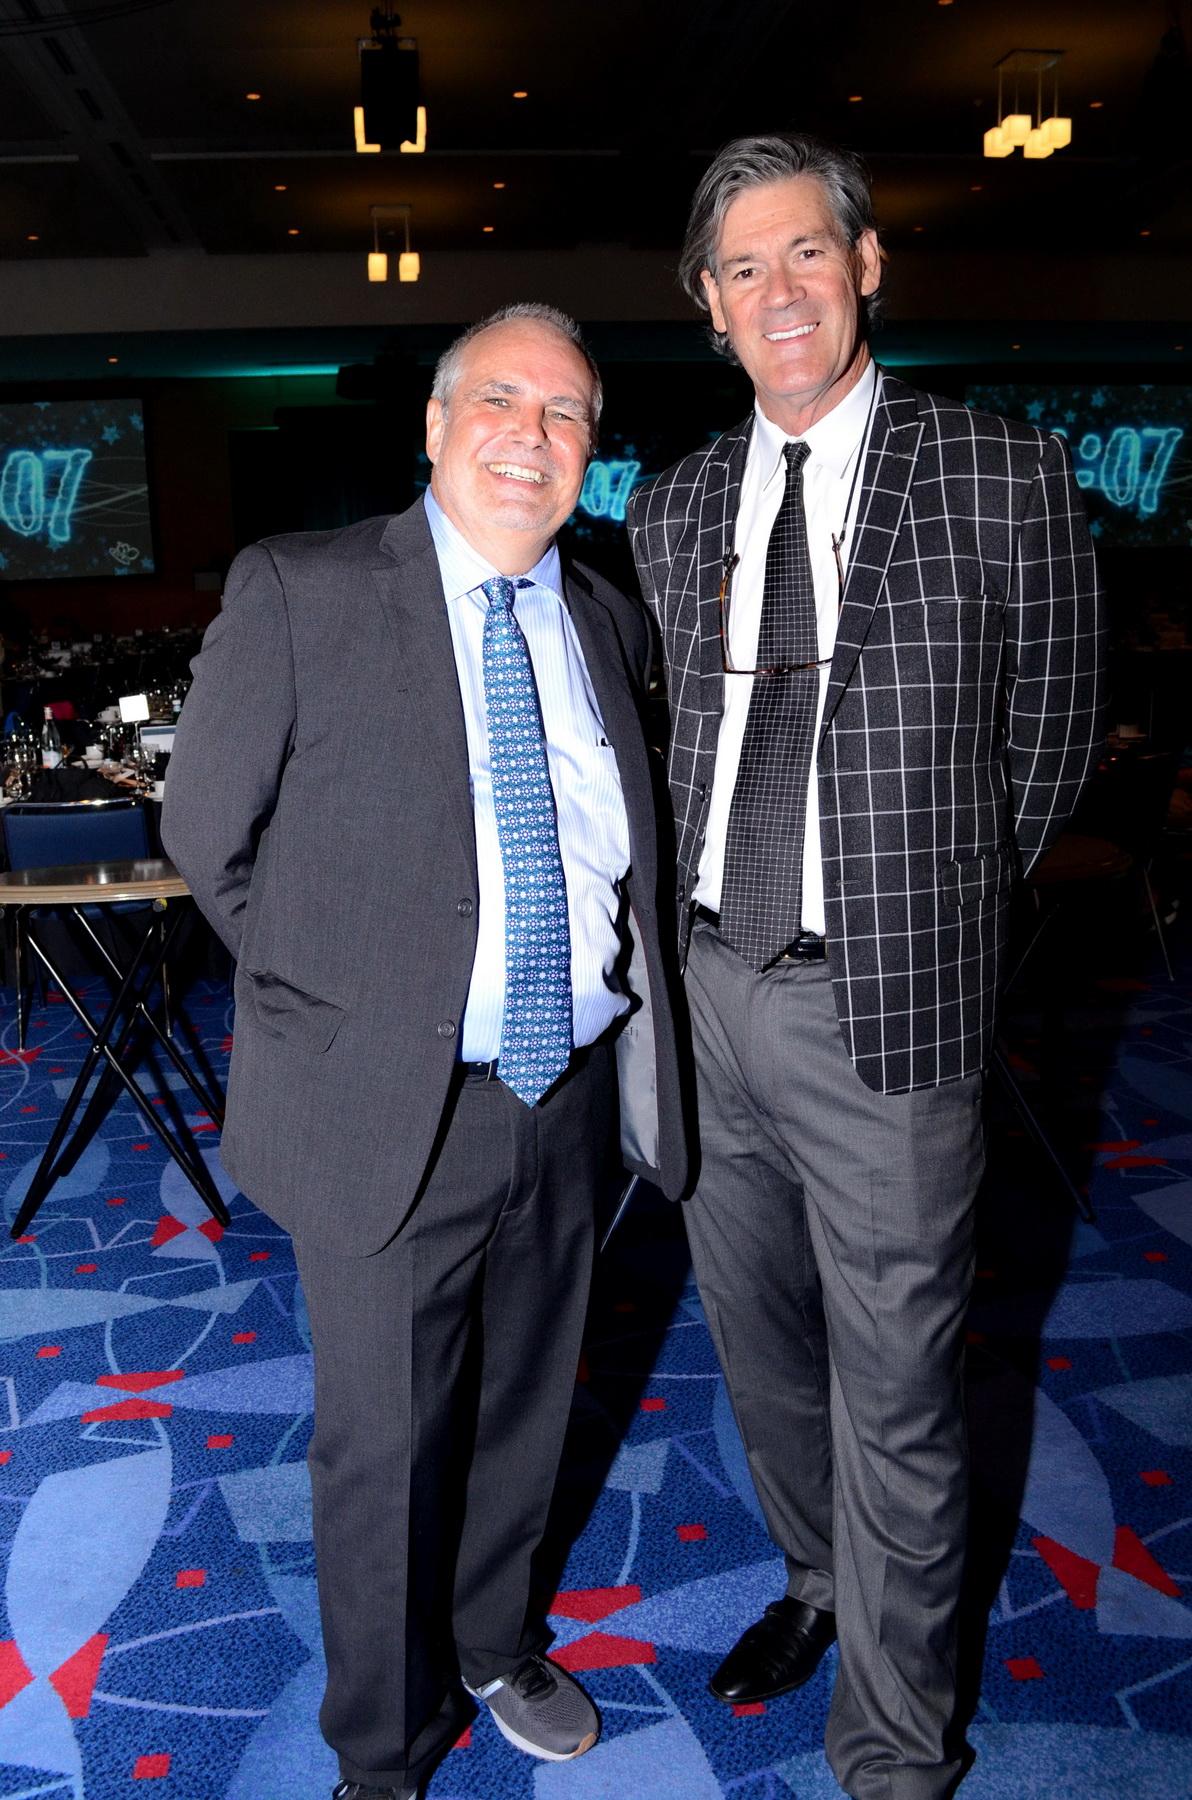 Chris Mapes and Michael Haun.